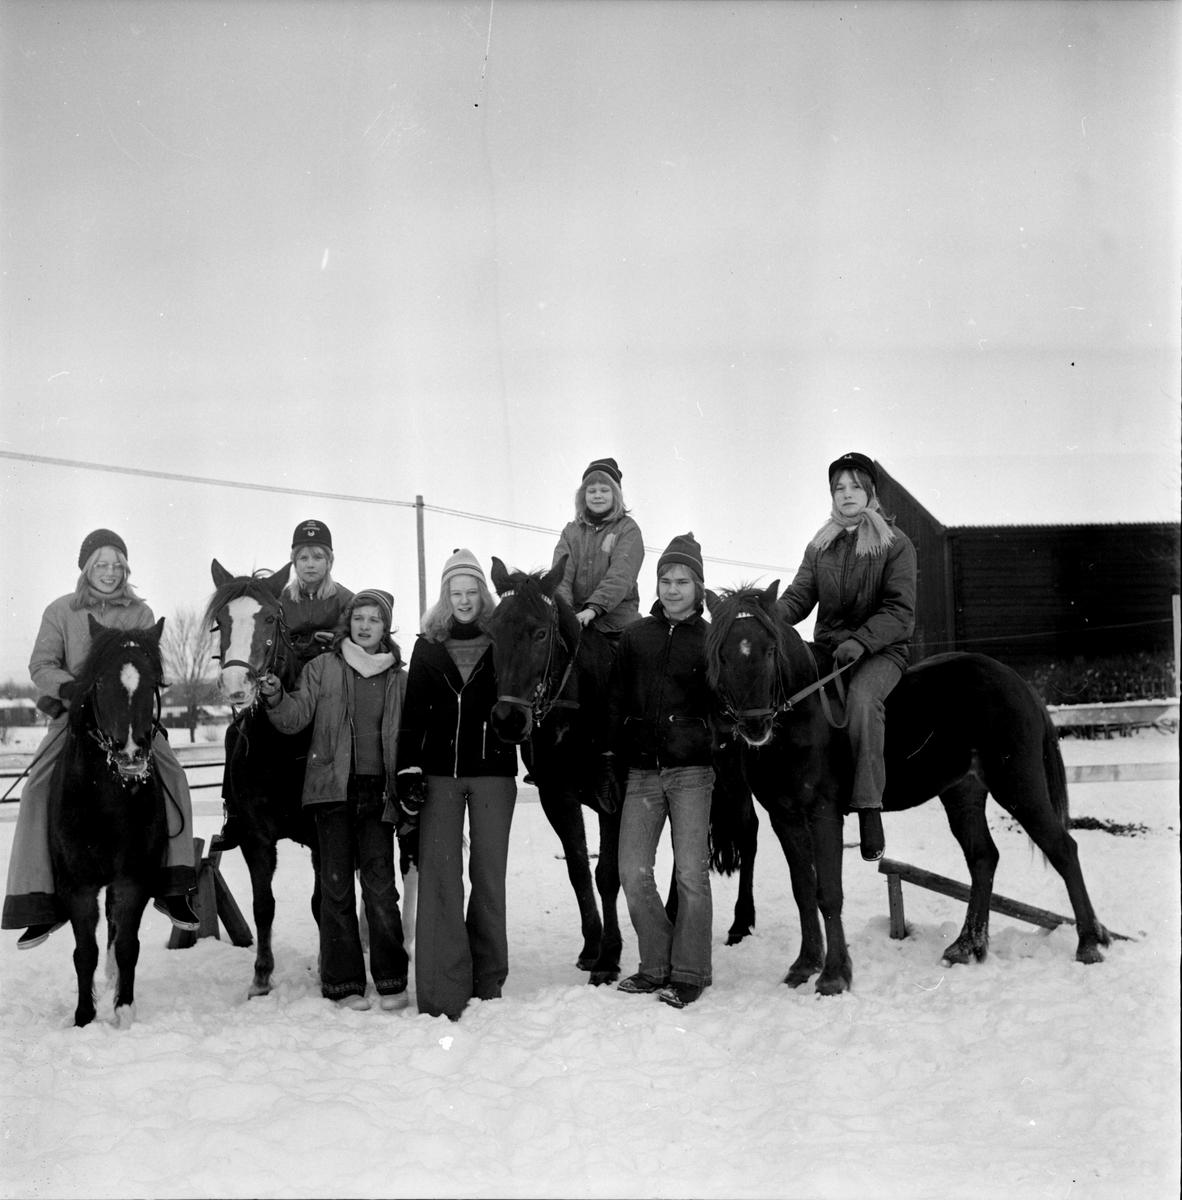 Koldemo, Ridskola, Per o Mari Eriksson, Januari 1973